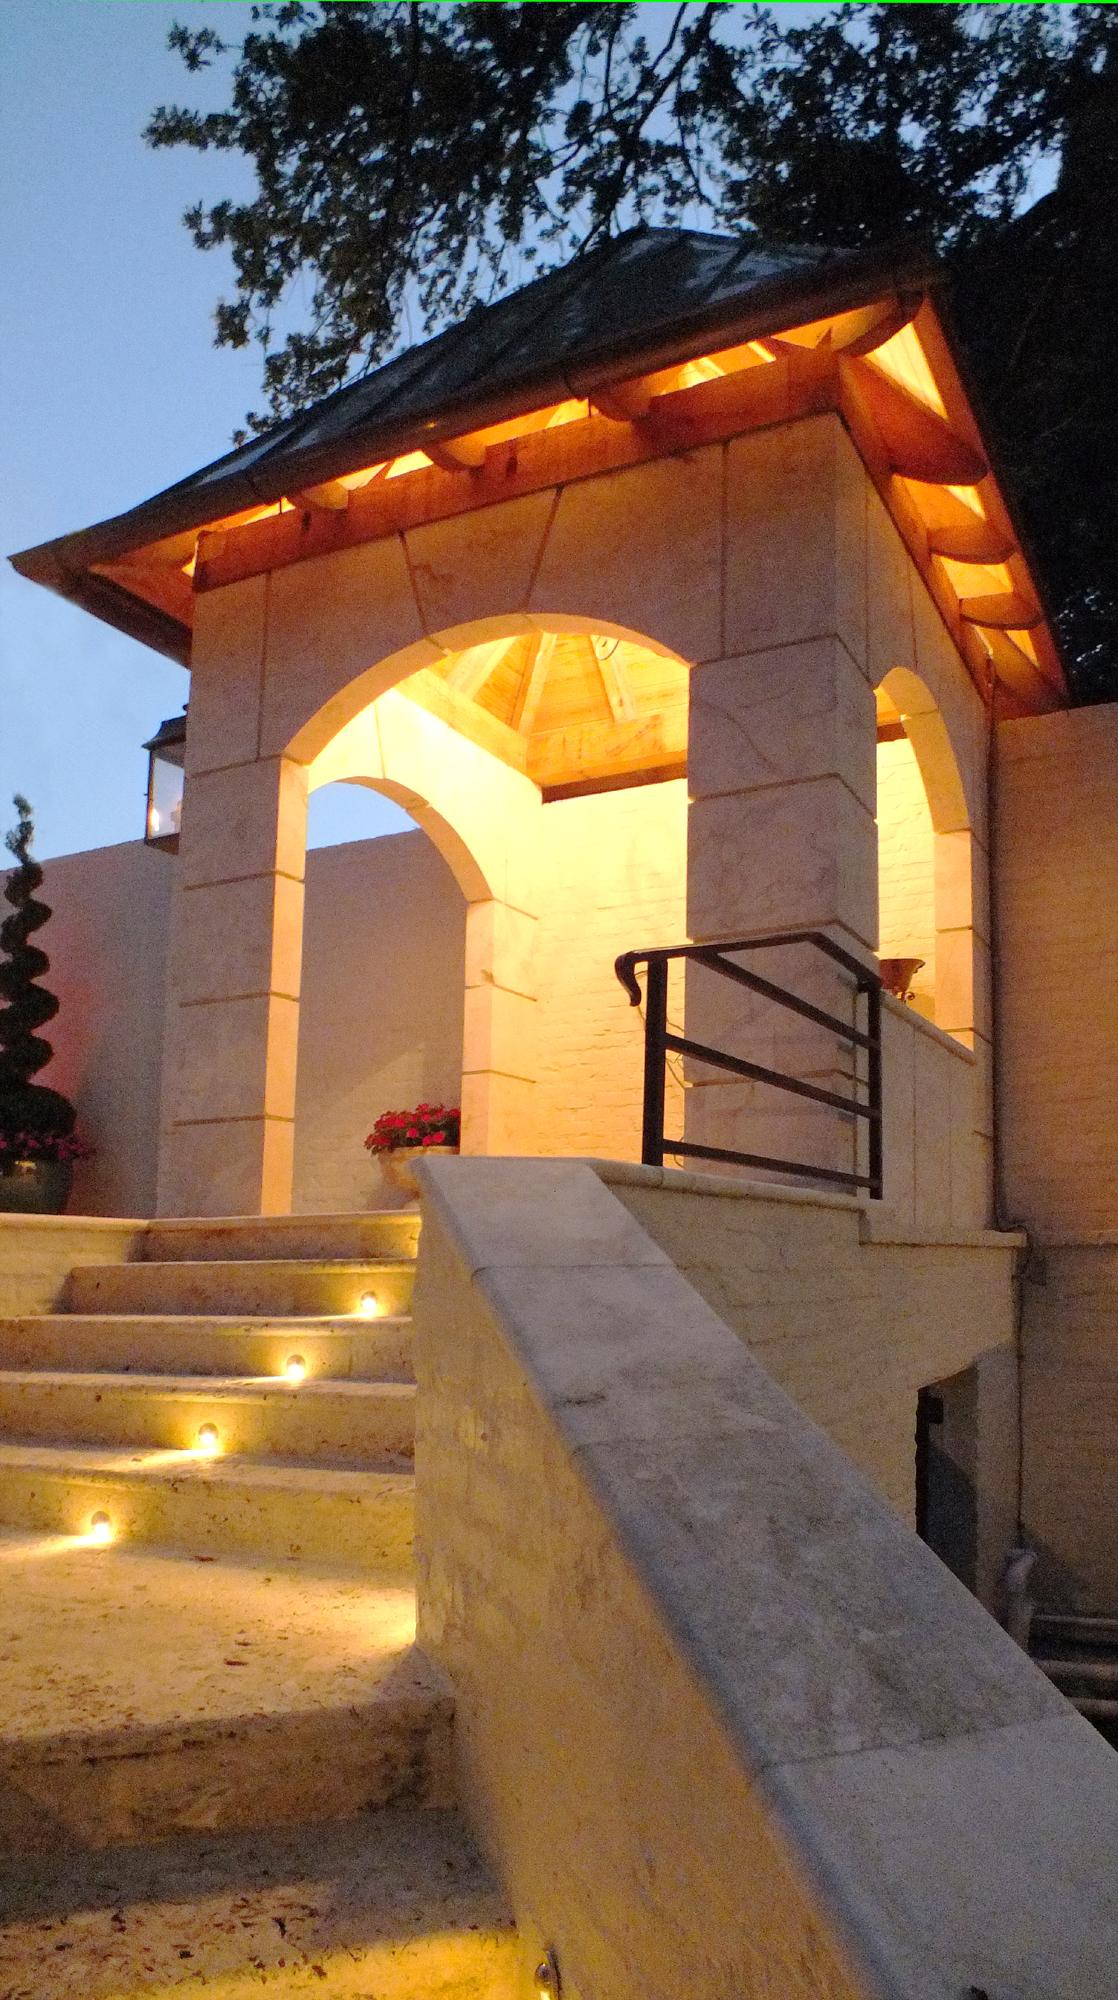 Bella Dura_Psgwy House_Macedonia Limestone_1118x2000_DSCF1230.jpg